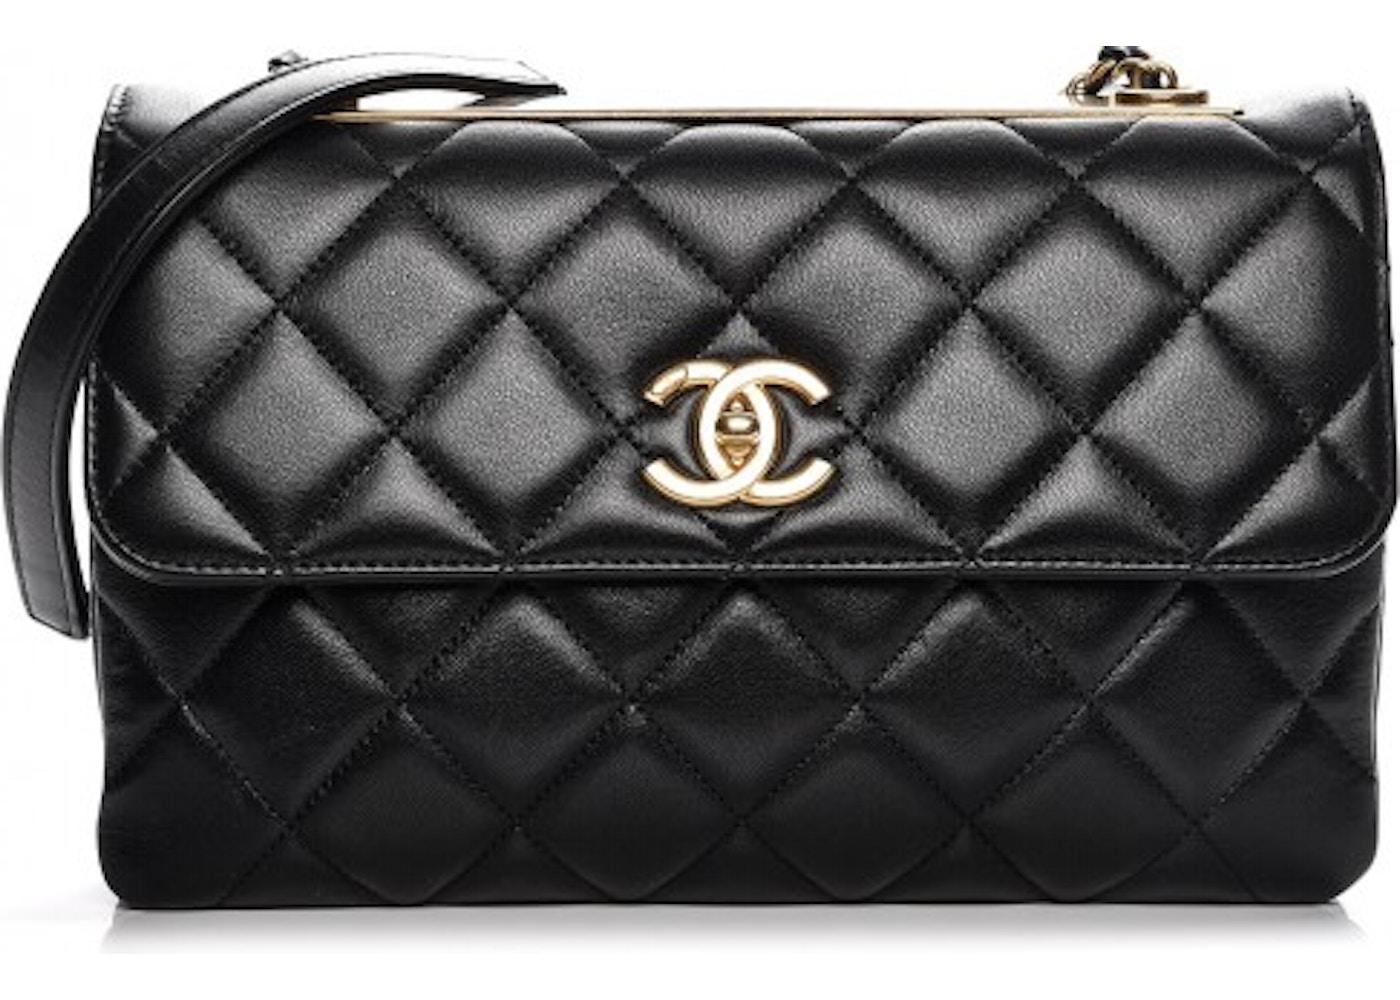 76fe7b76bcfdfe Chanel Trendy CC Flap Diamond Quilted Medium Black. Diamond Quilted Medium  Black